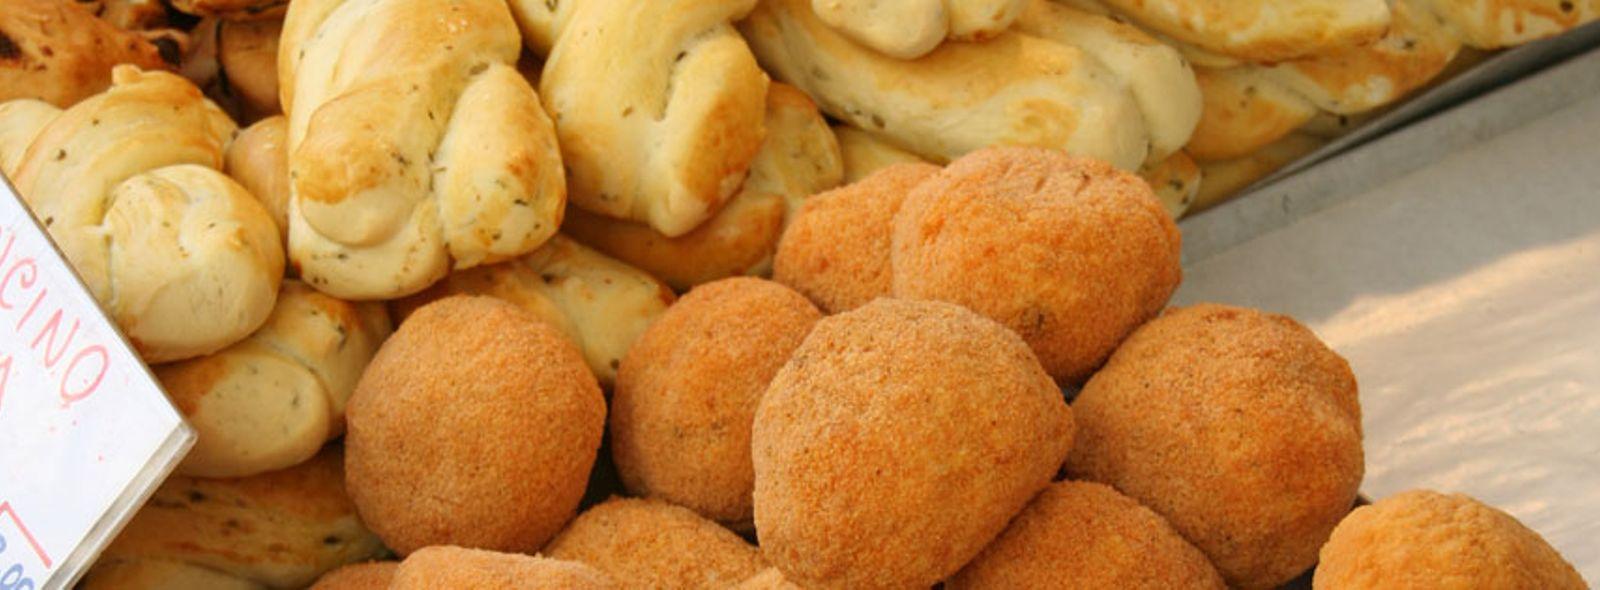 Street food da provare al Vomero